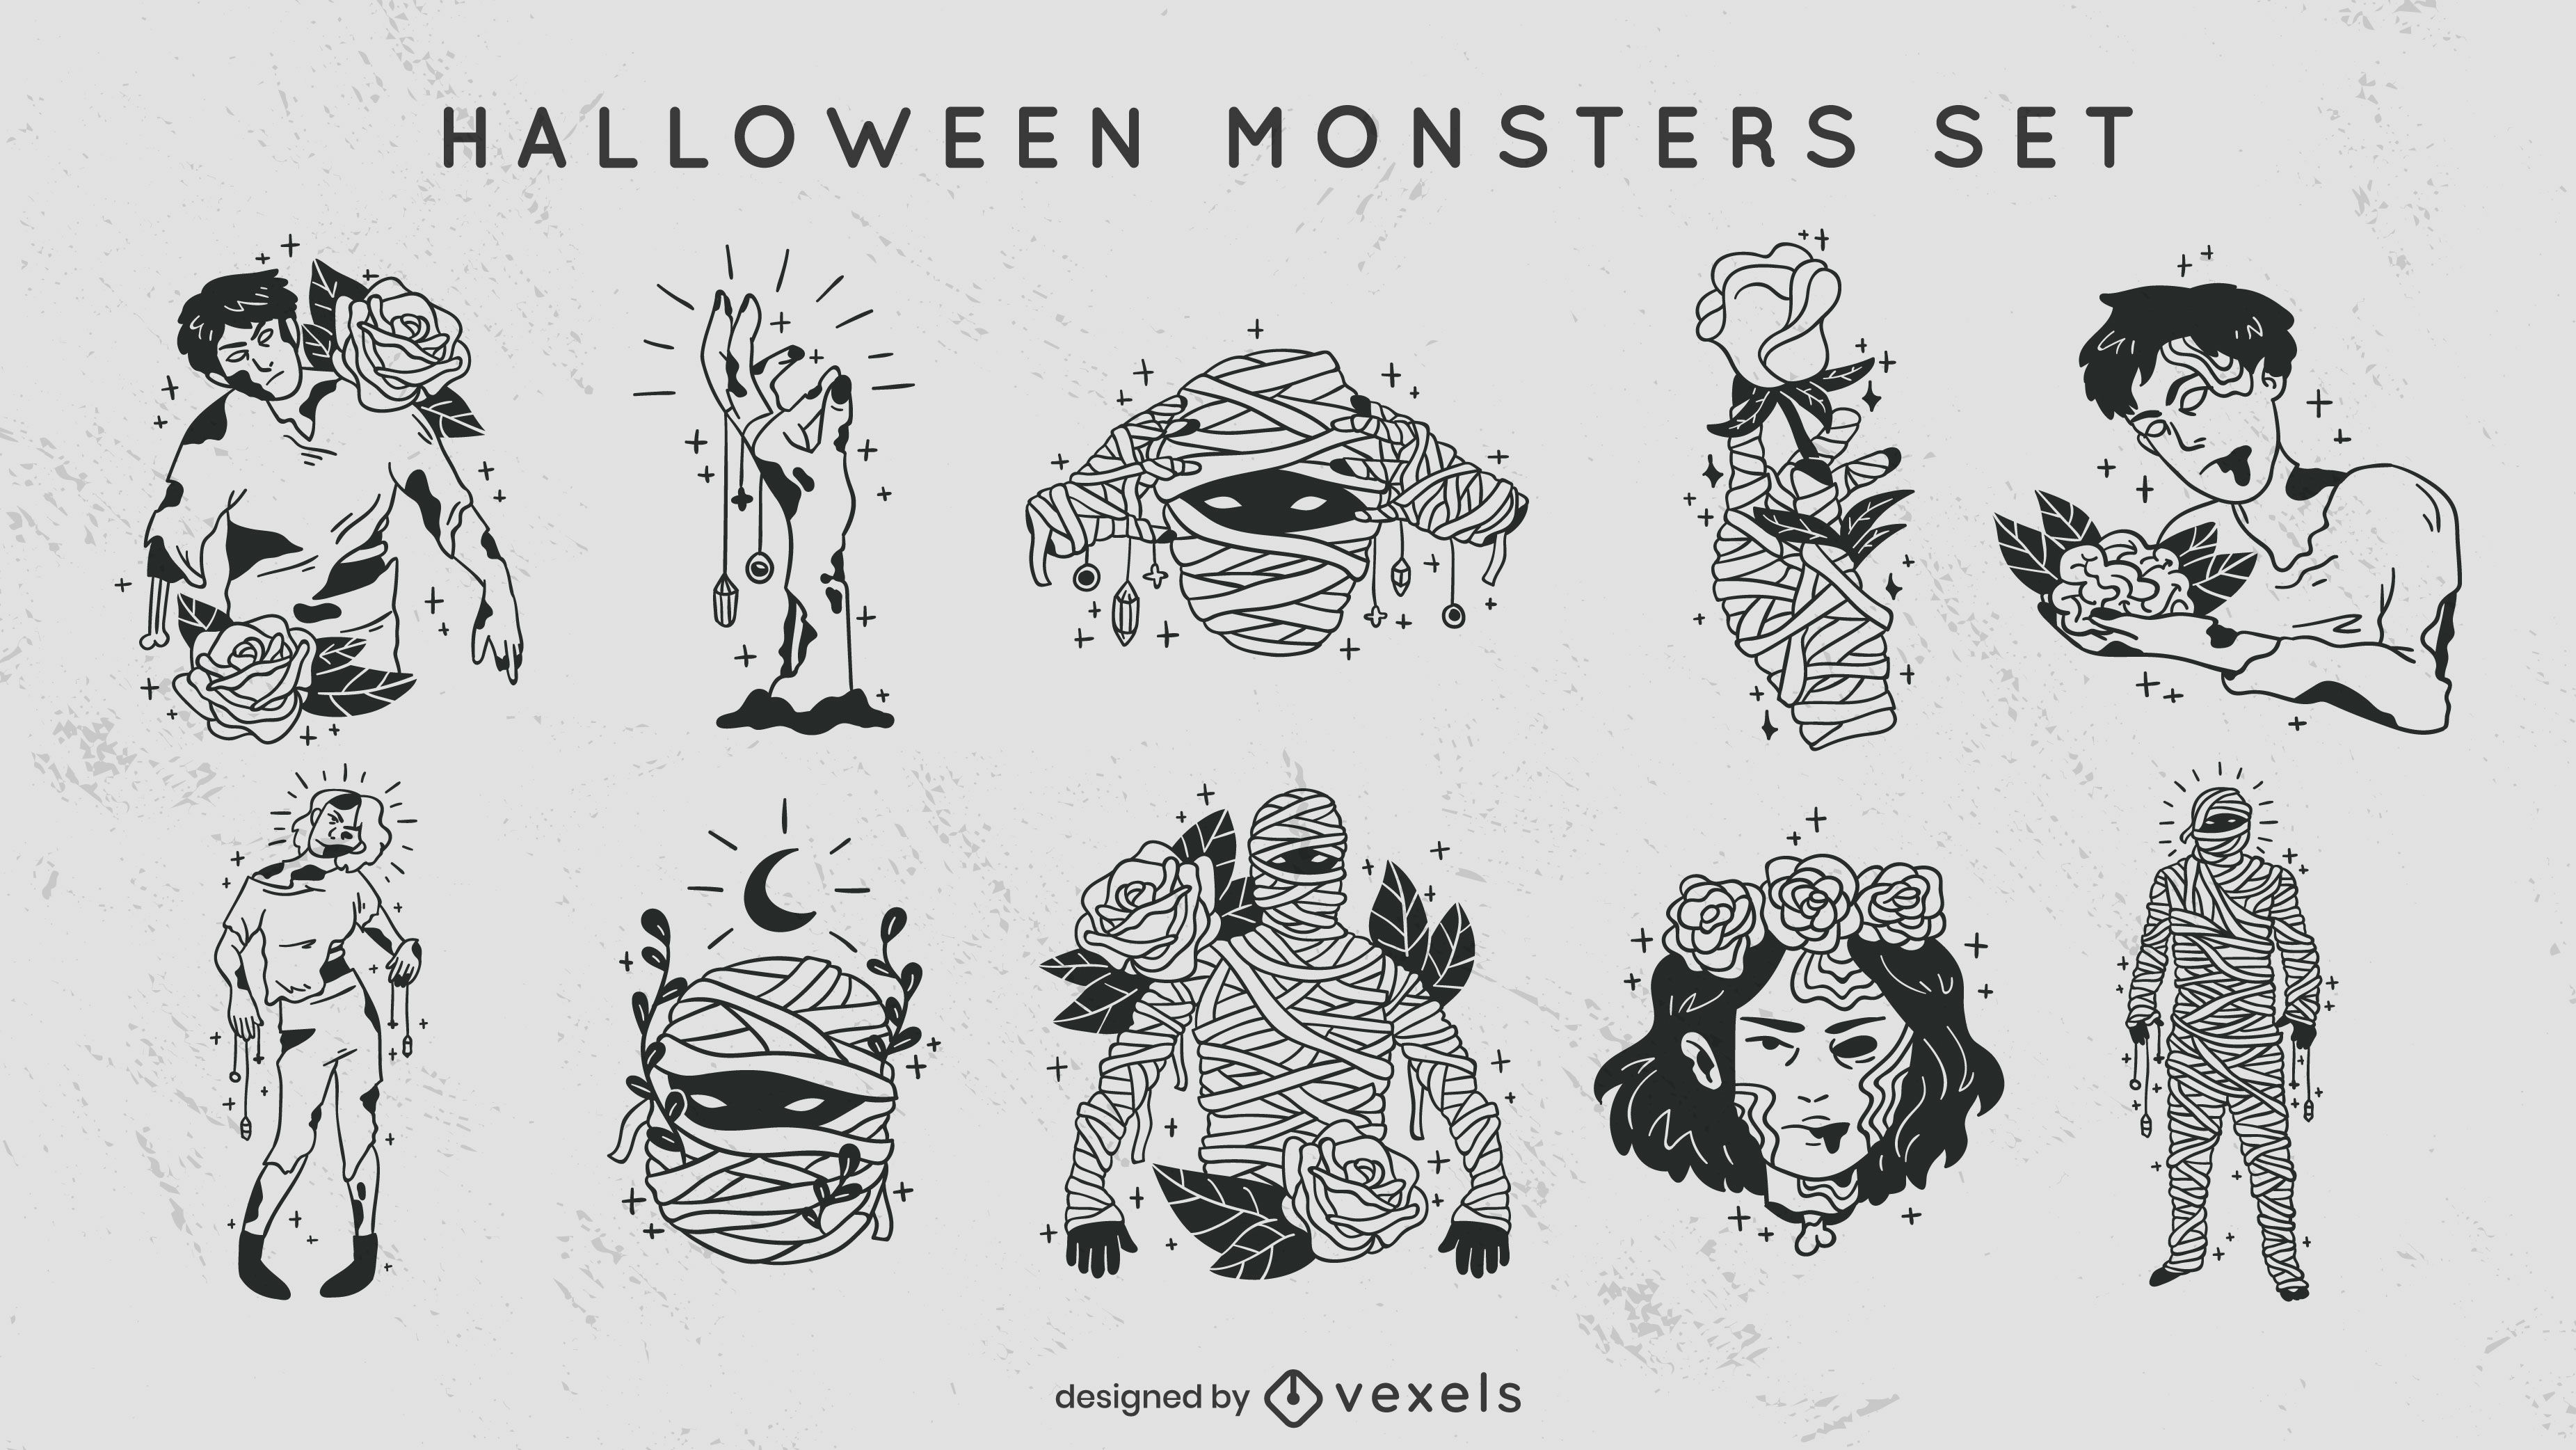 Conjunto de derrames preenchidos com monstros de Halloween